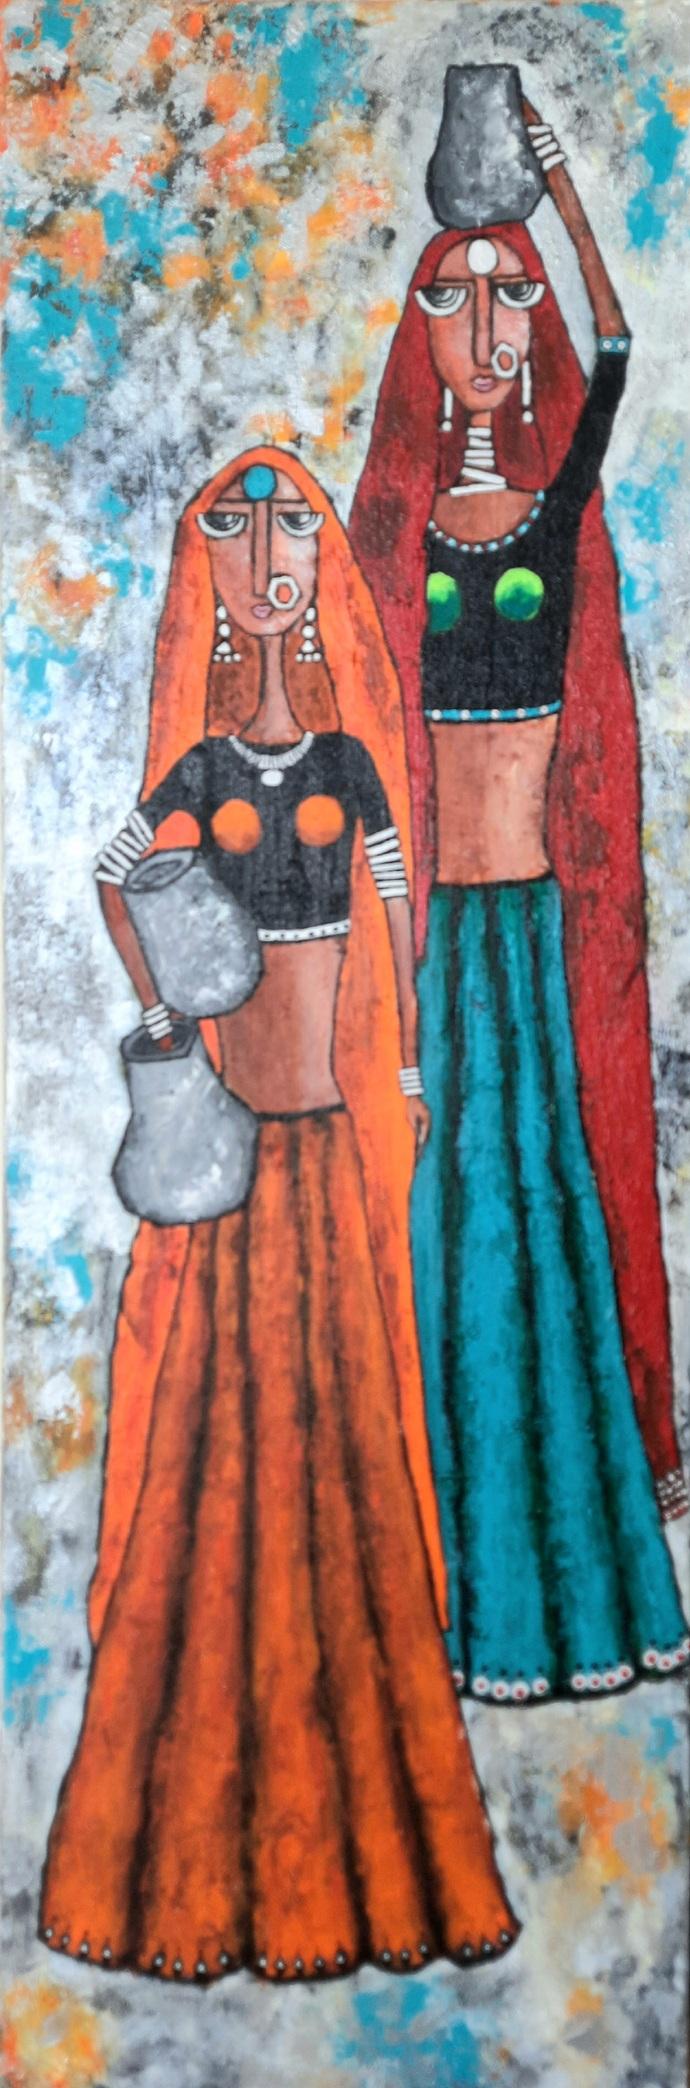 Indian contemporary Digital Print by Nidhi Gupta,Expressionism